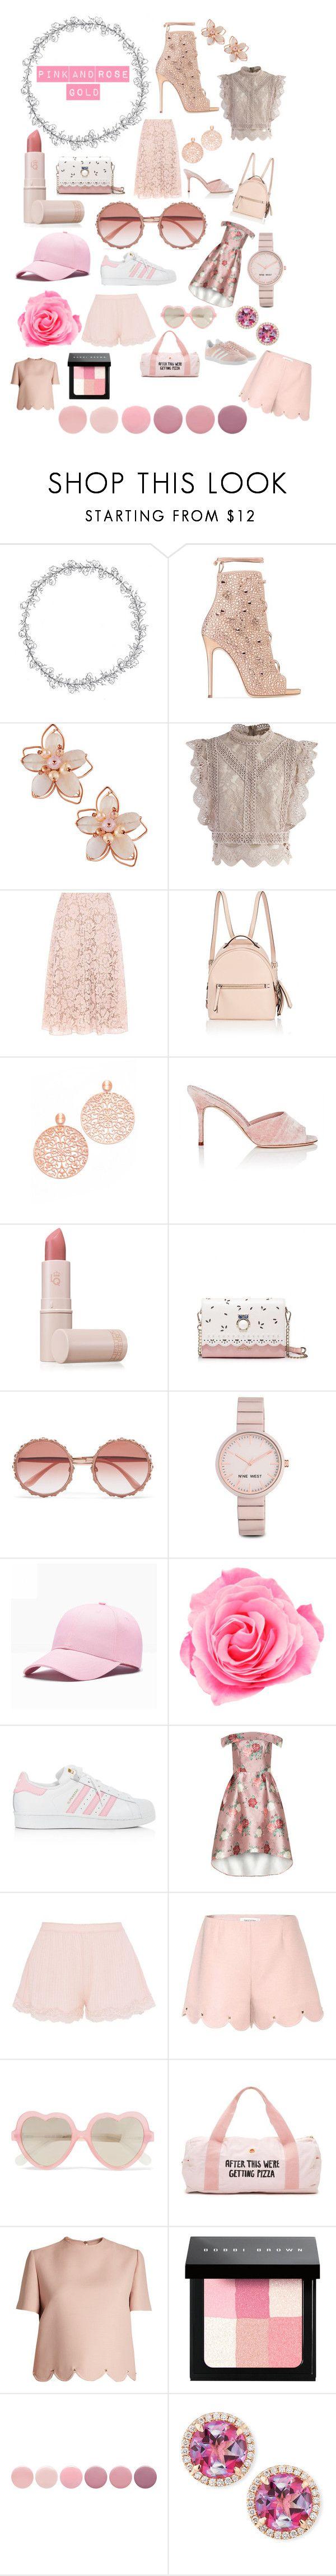 """Pink and Rose Gold"" by sunshineirwinx ❤ liked on Polyvore featuring Giuseppe Zanotti, NAKAMOL, Chicwish, Valentino, Fendi, Bronzallure, Manolo Blahnik, Lipstick Queen, Dolce&Gabbana and Nine West"